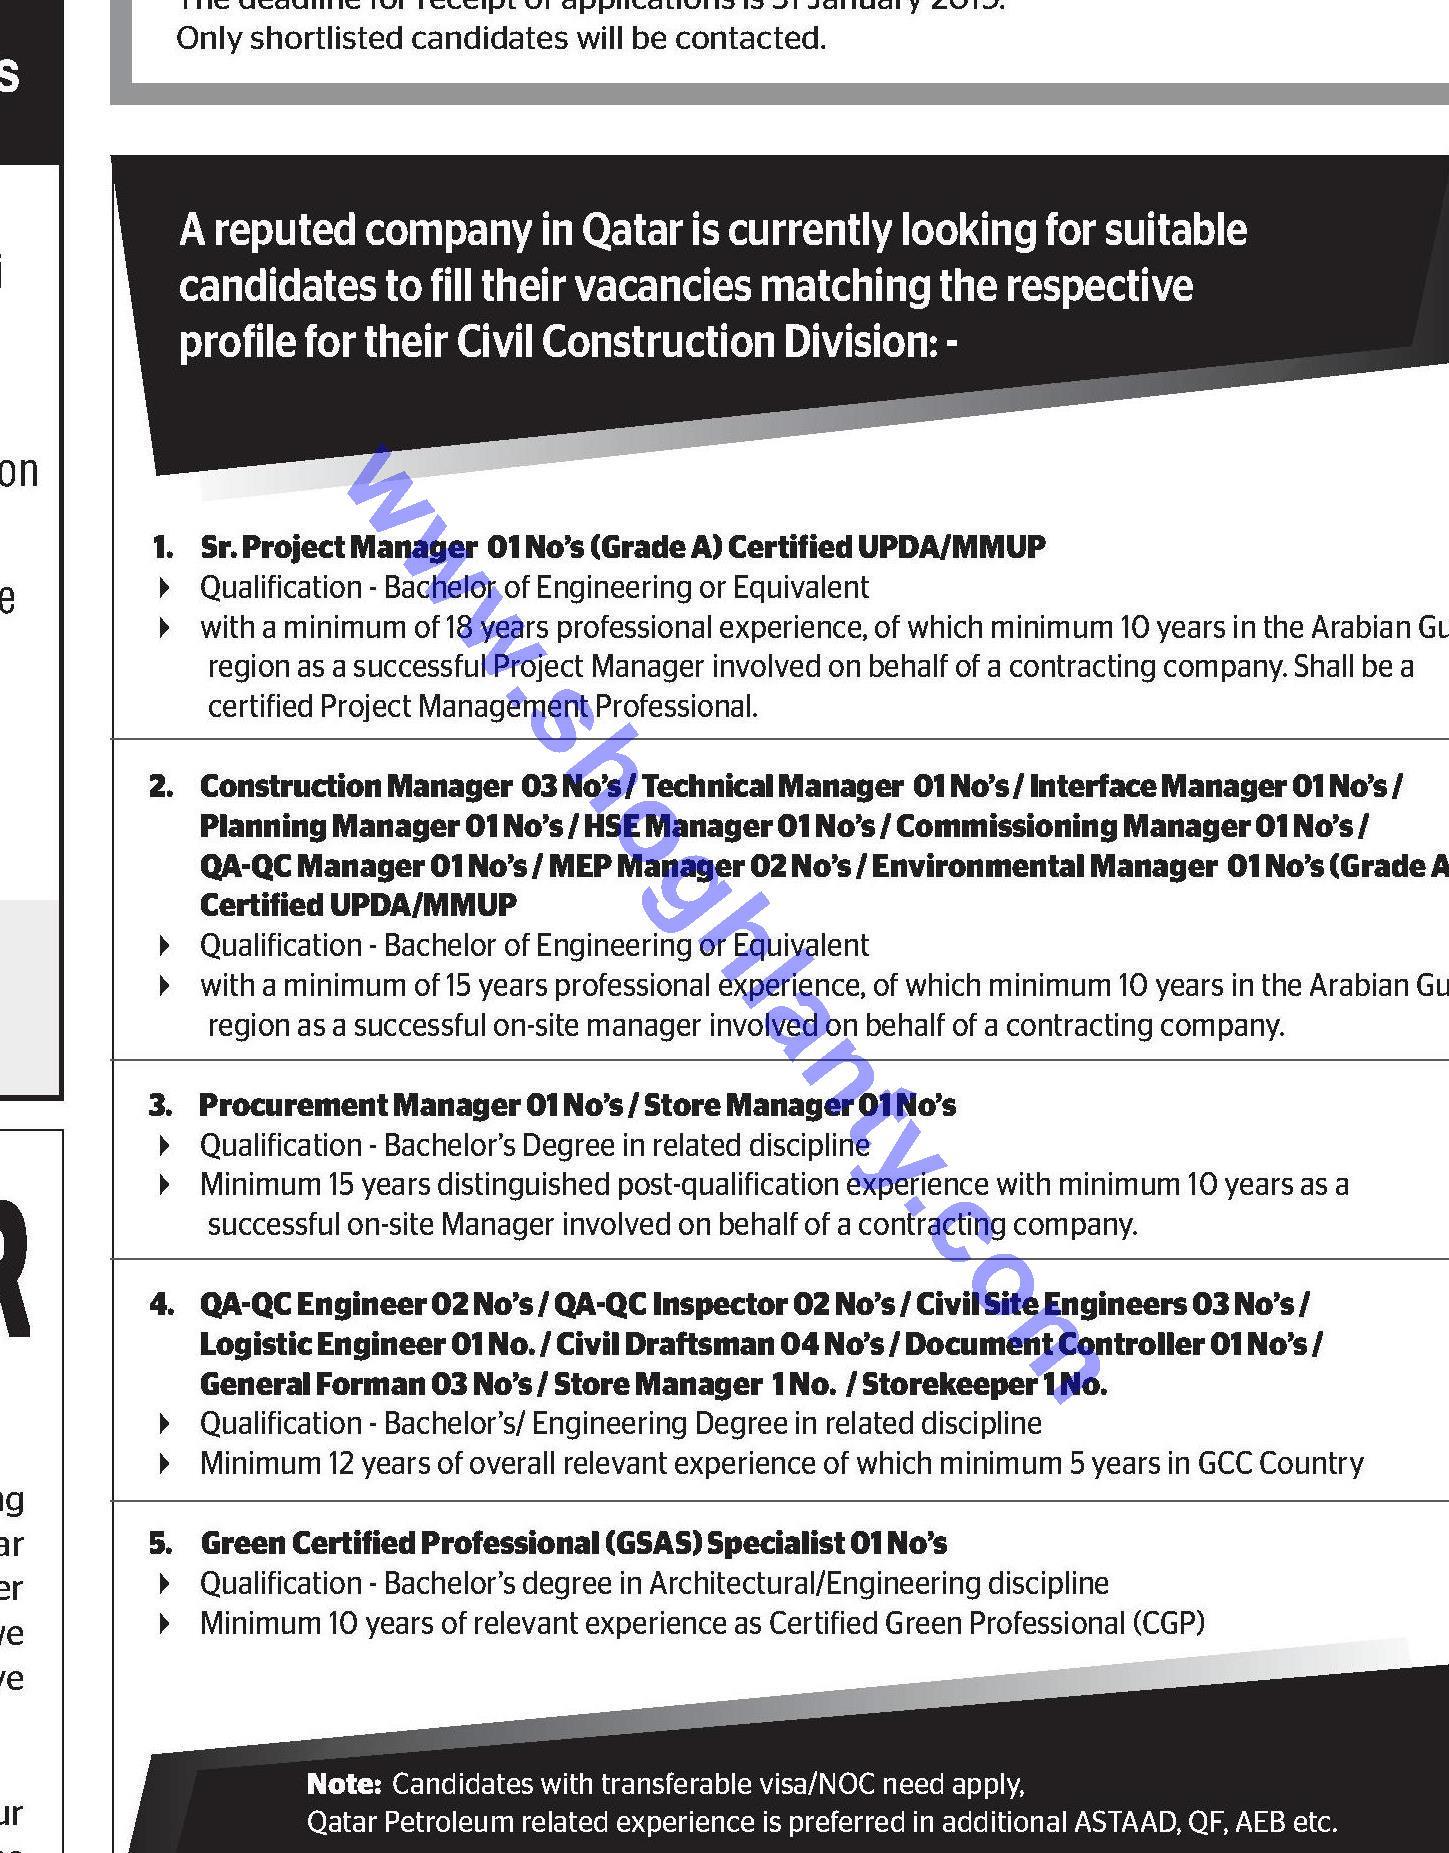 Jobs Purchasing manager-Qatar- 20 January 2019